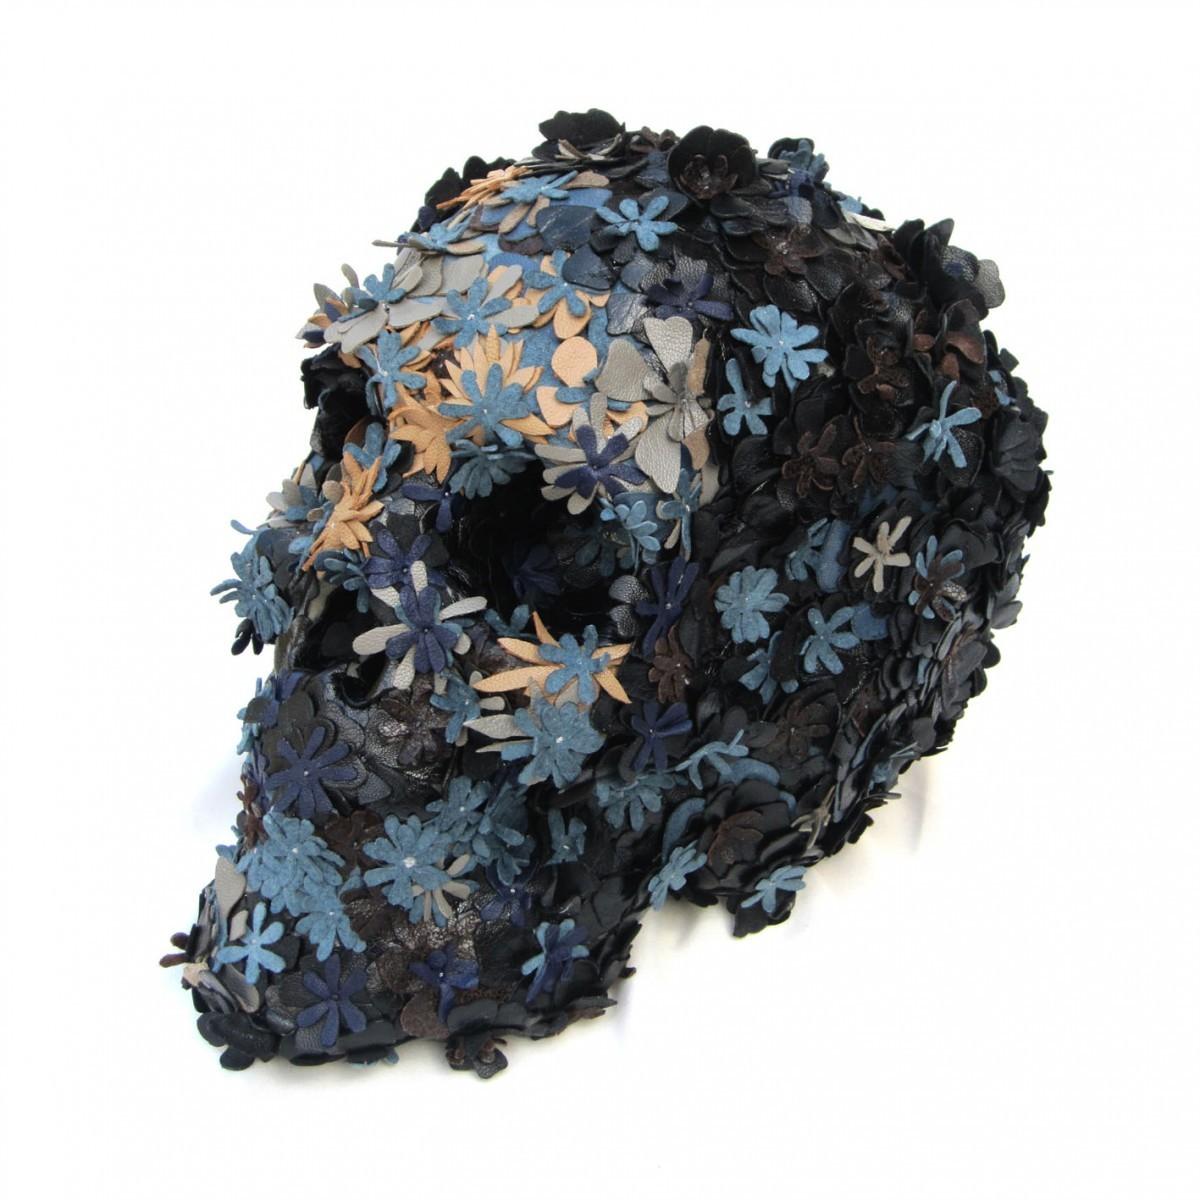 jacky-tsai-art-oldskull-9